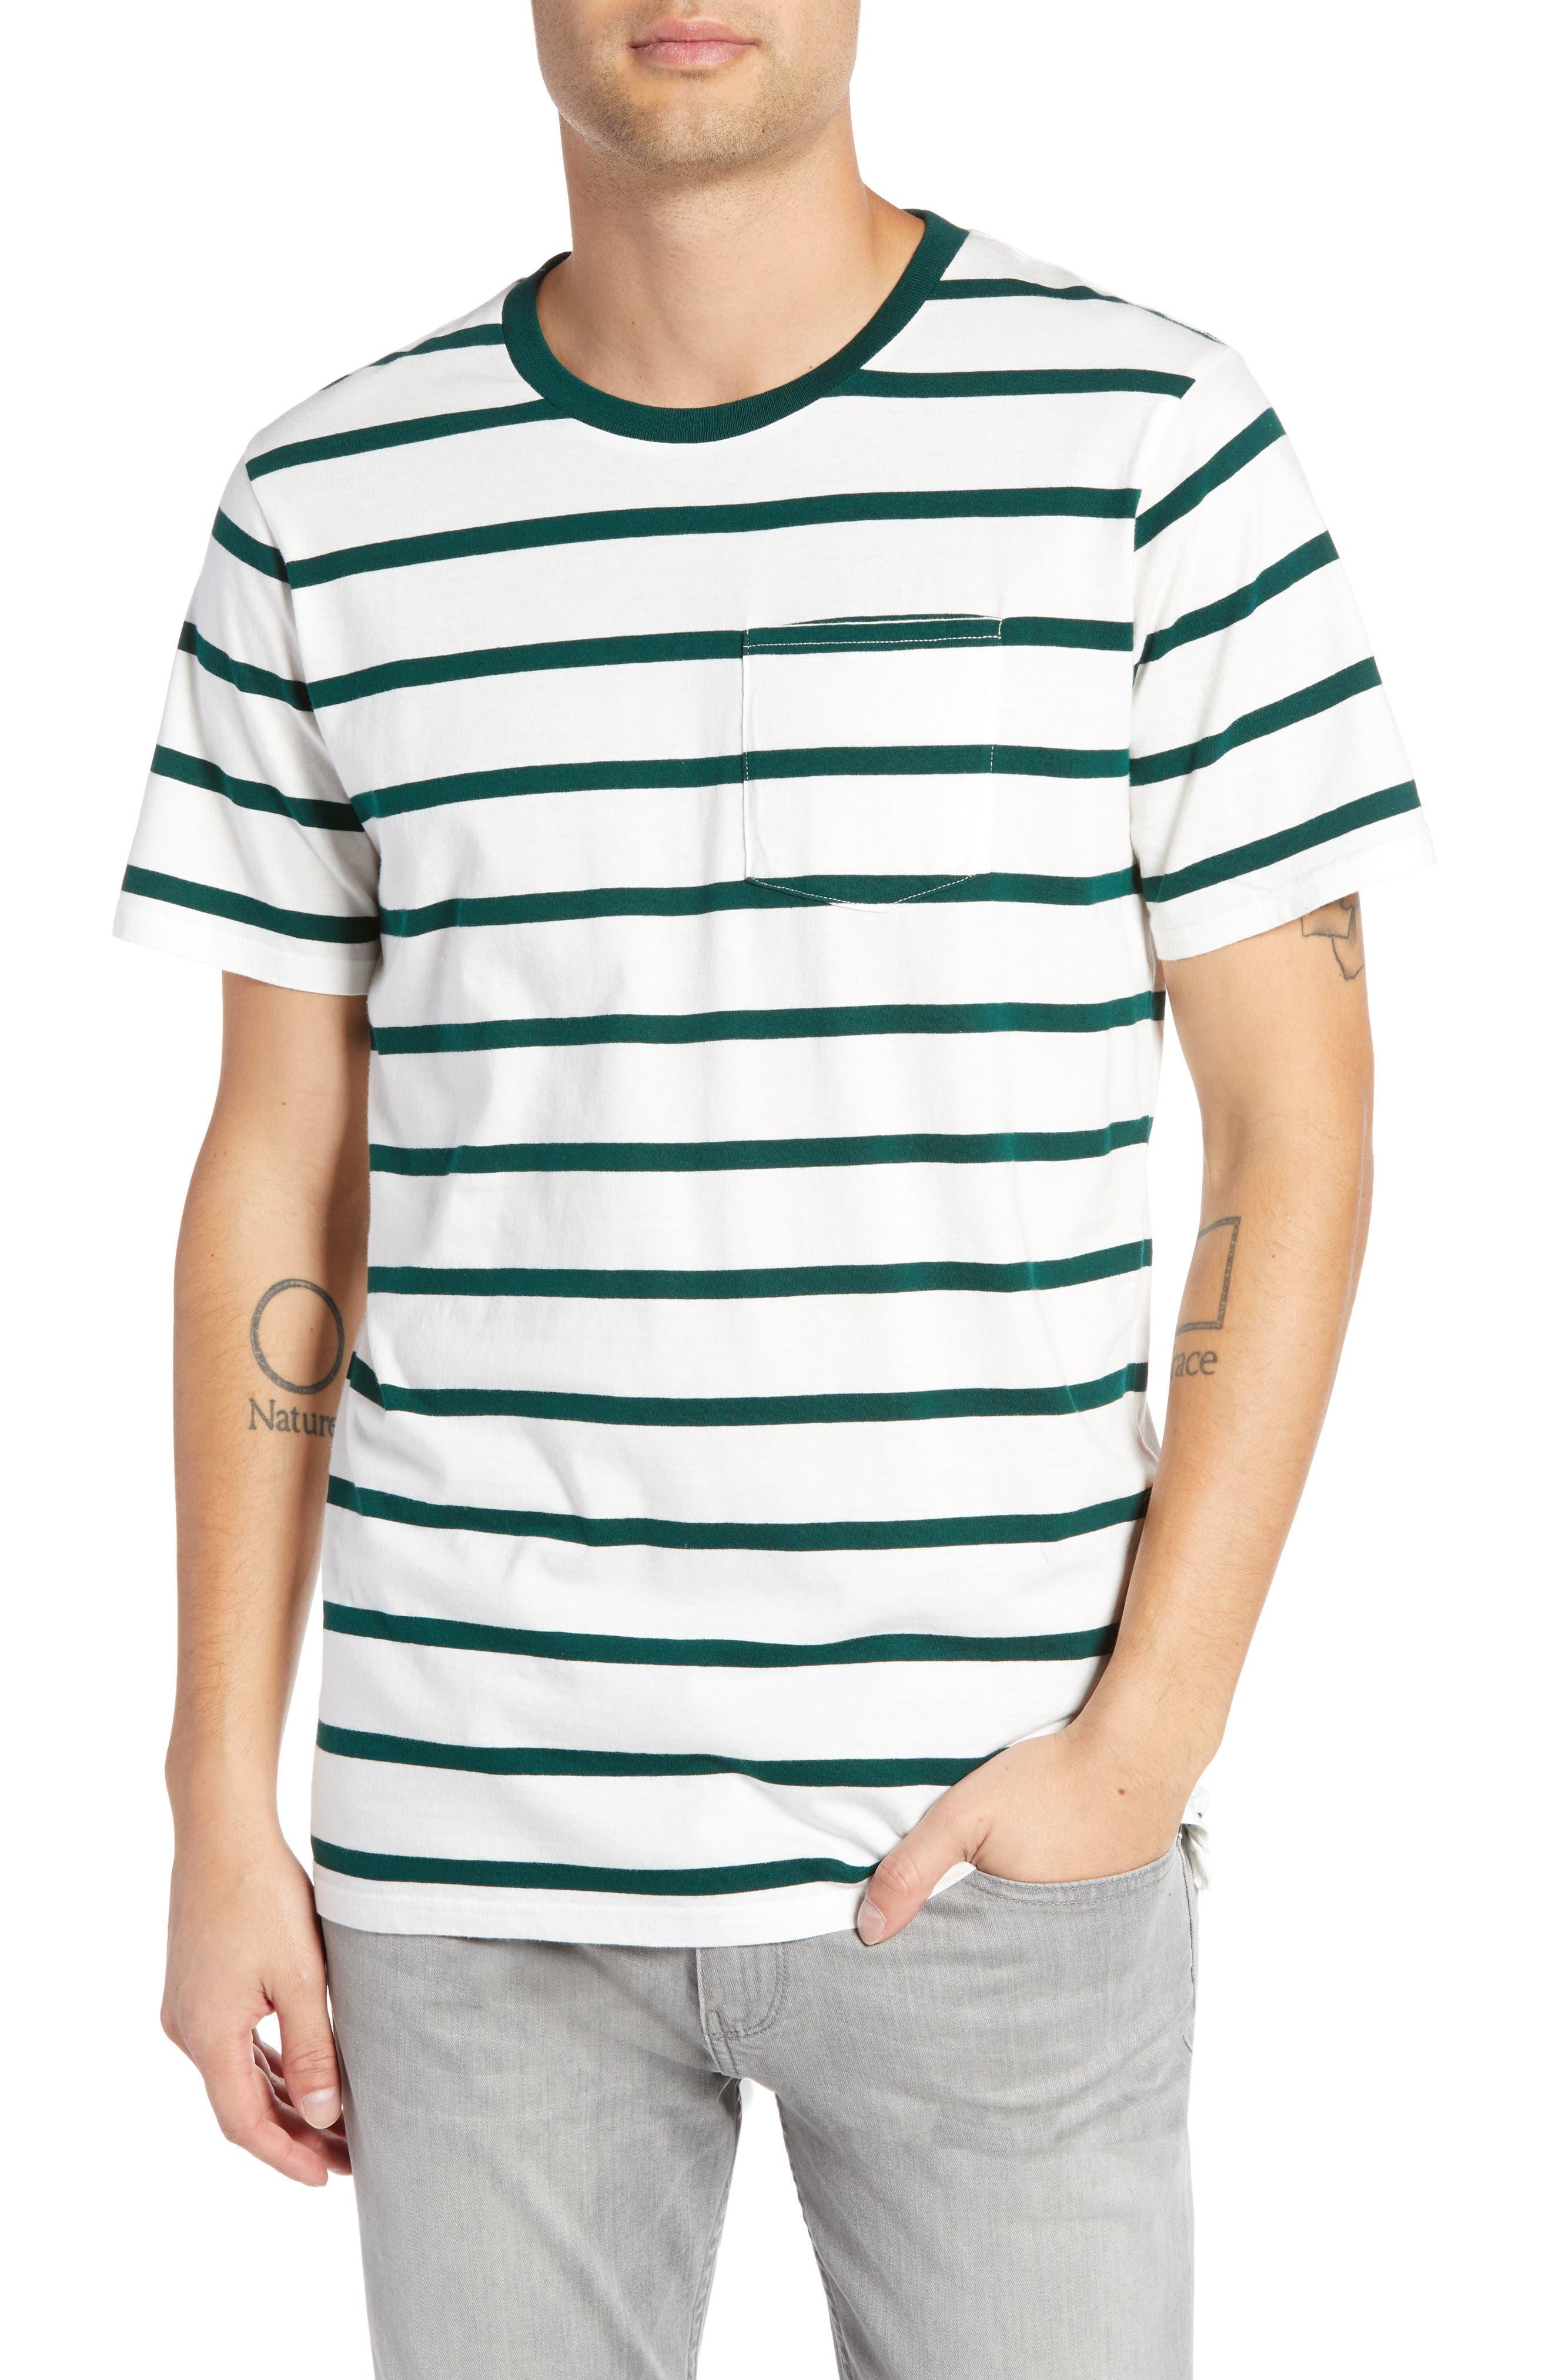 GLOBE Moonshine Pocket T-Shirt in Ecru